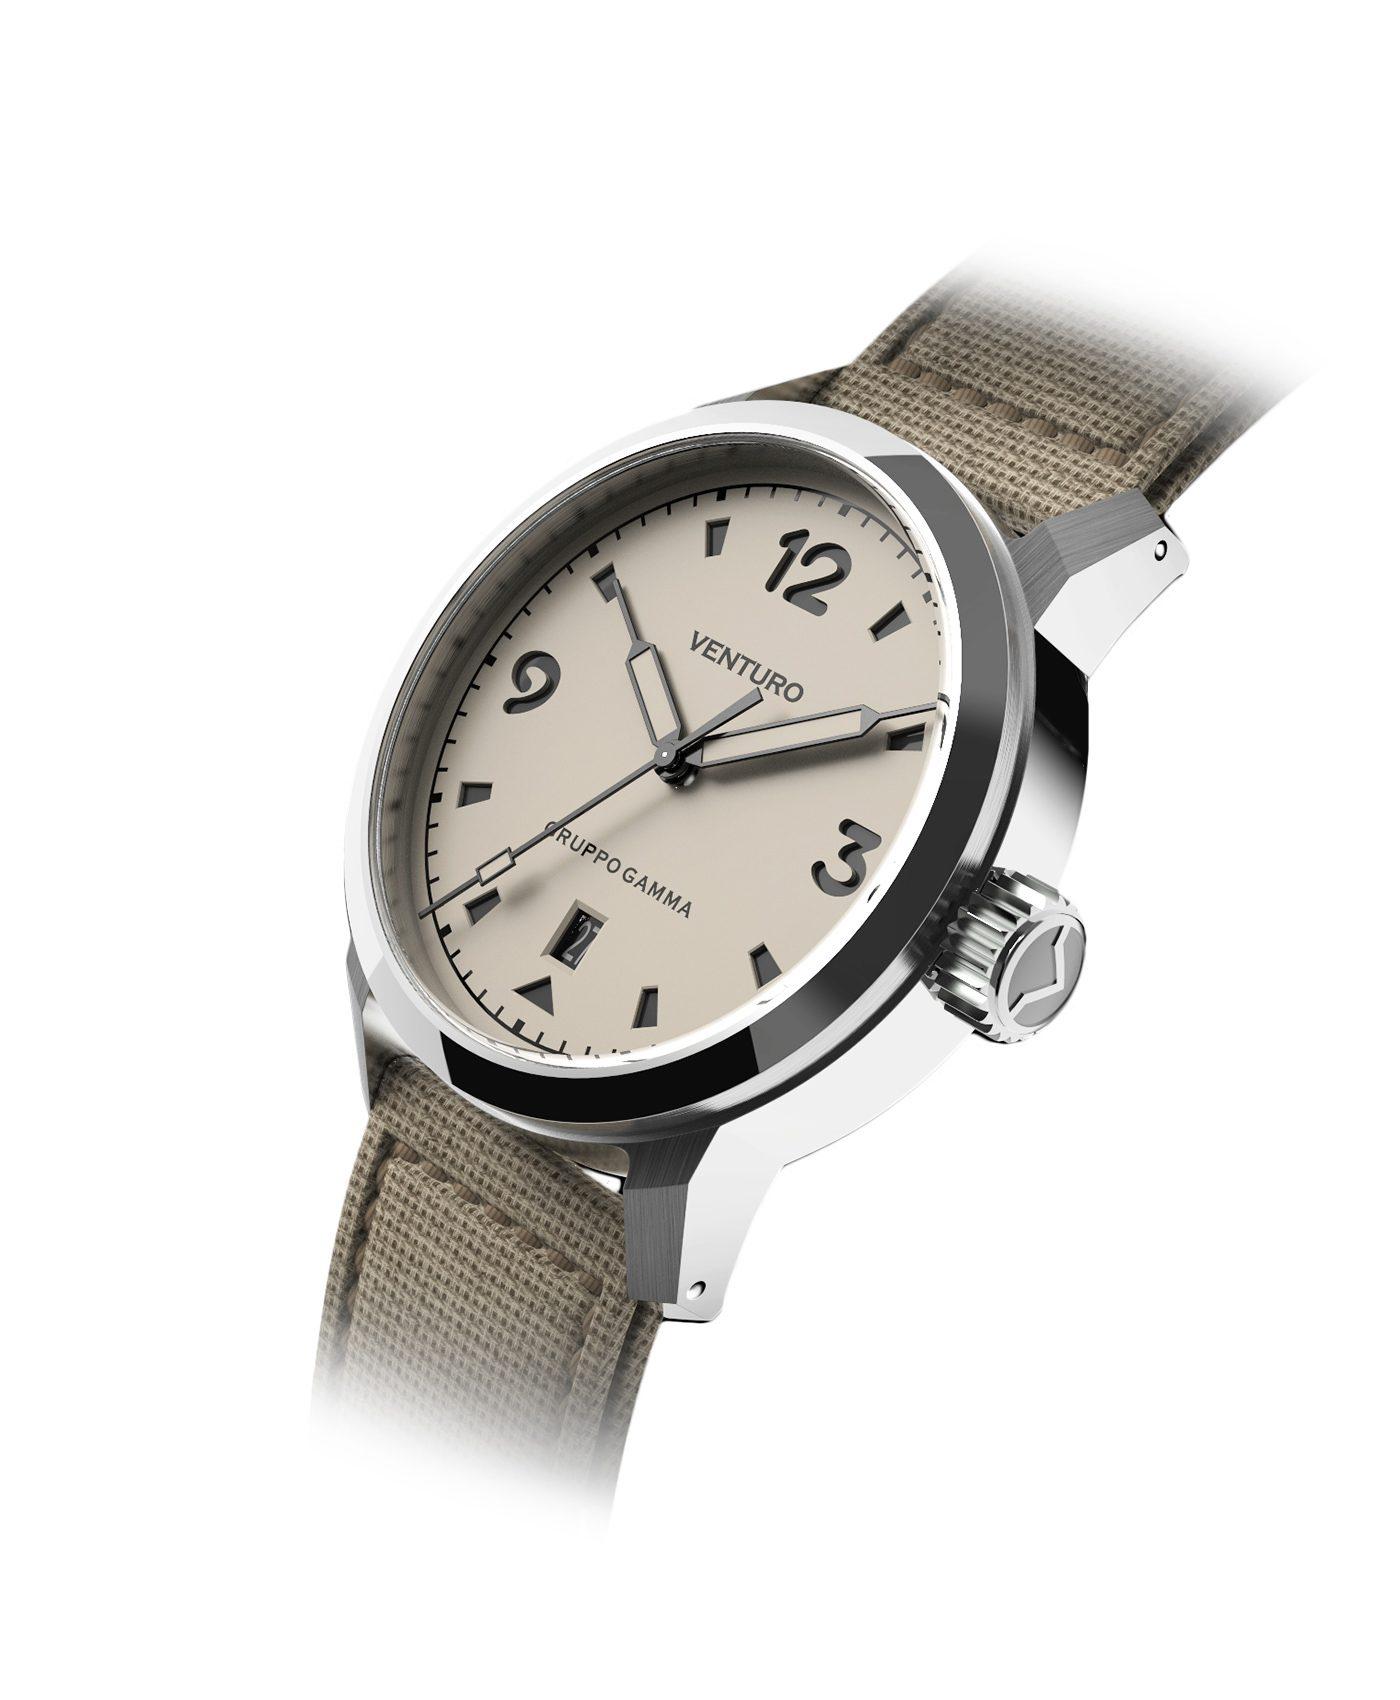 Venturo – Field Watch – Cream Full Lume Dial